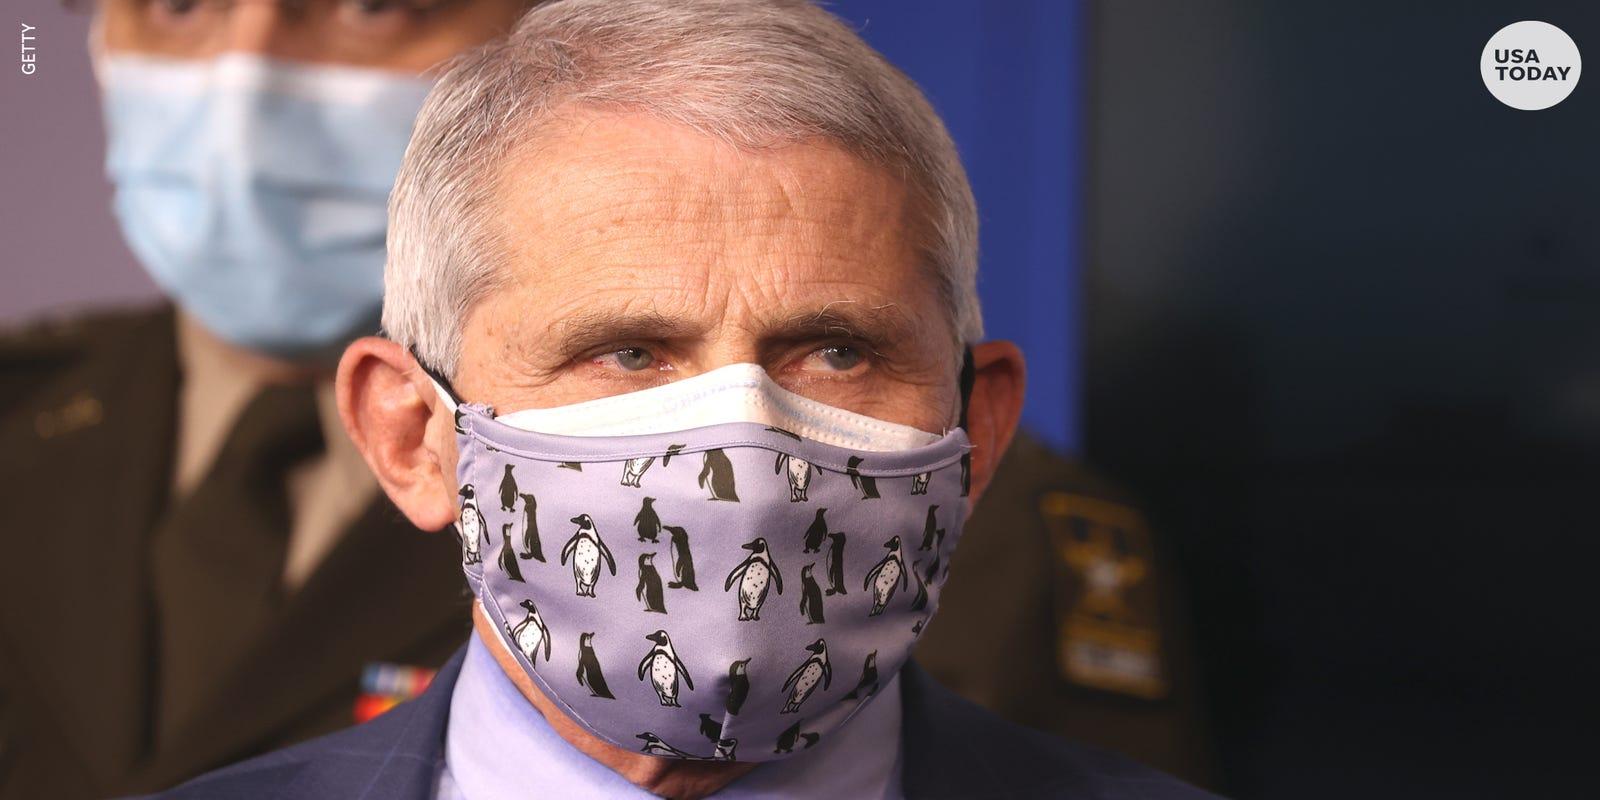 Start double masking, Bellin Health doctor says